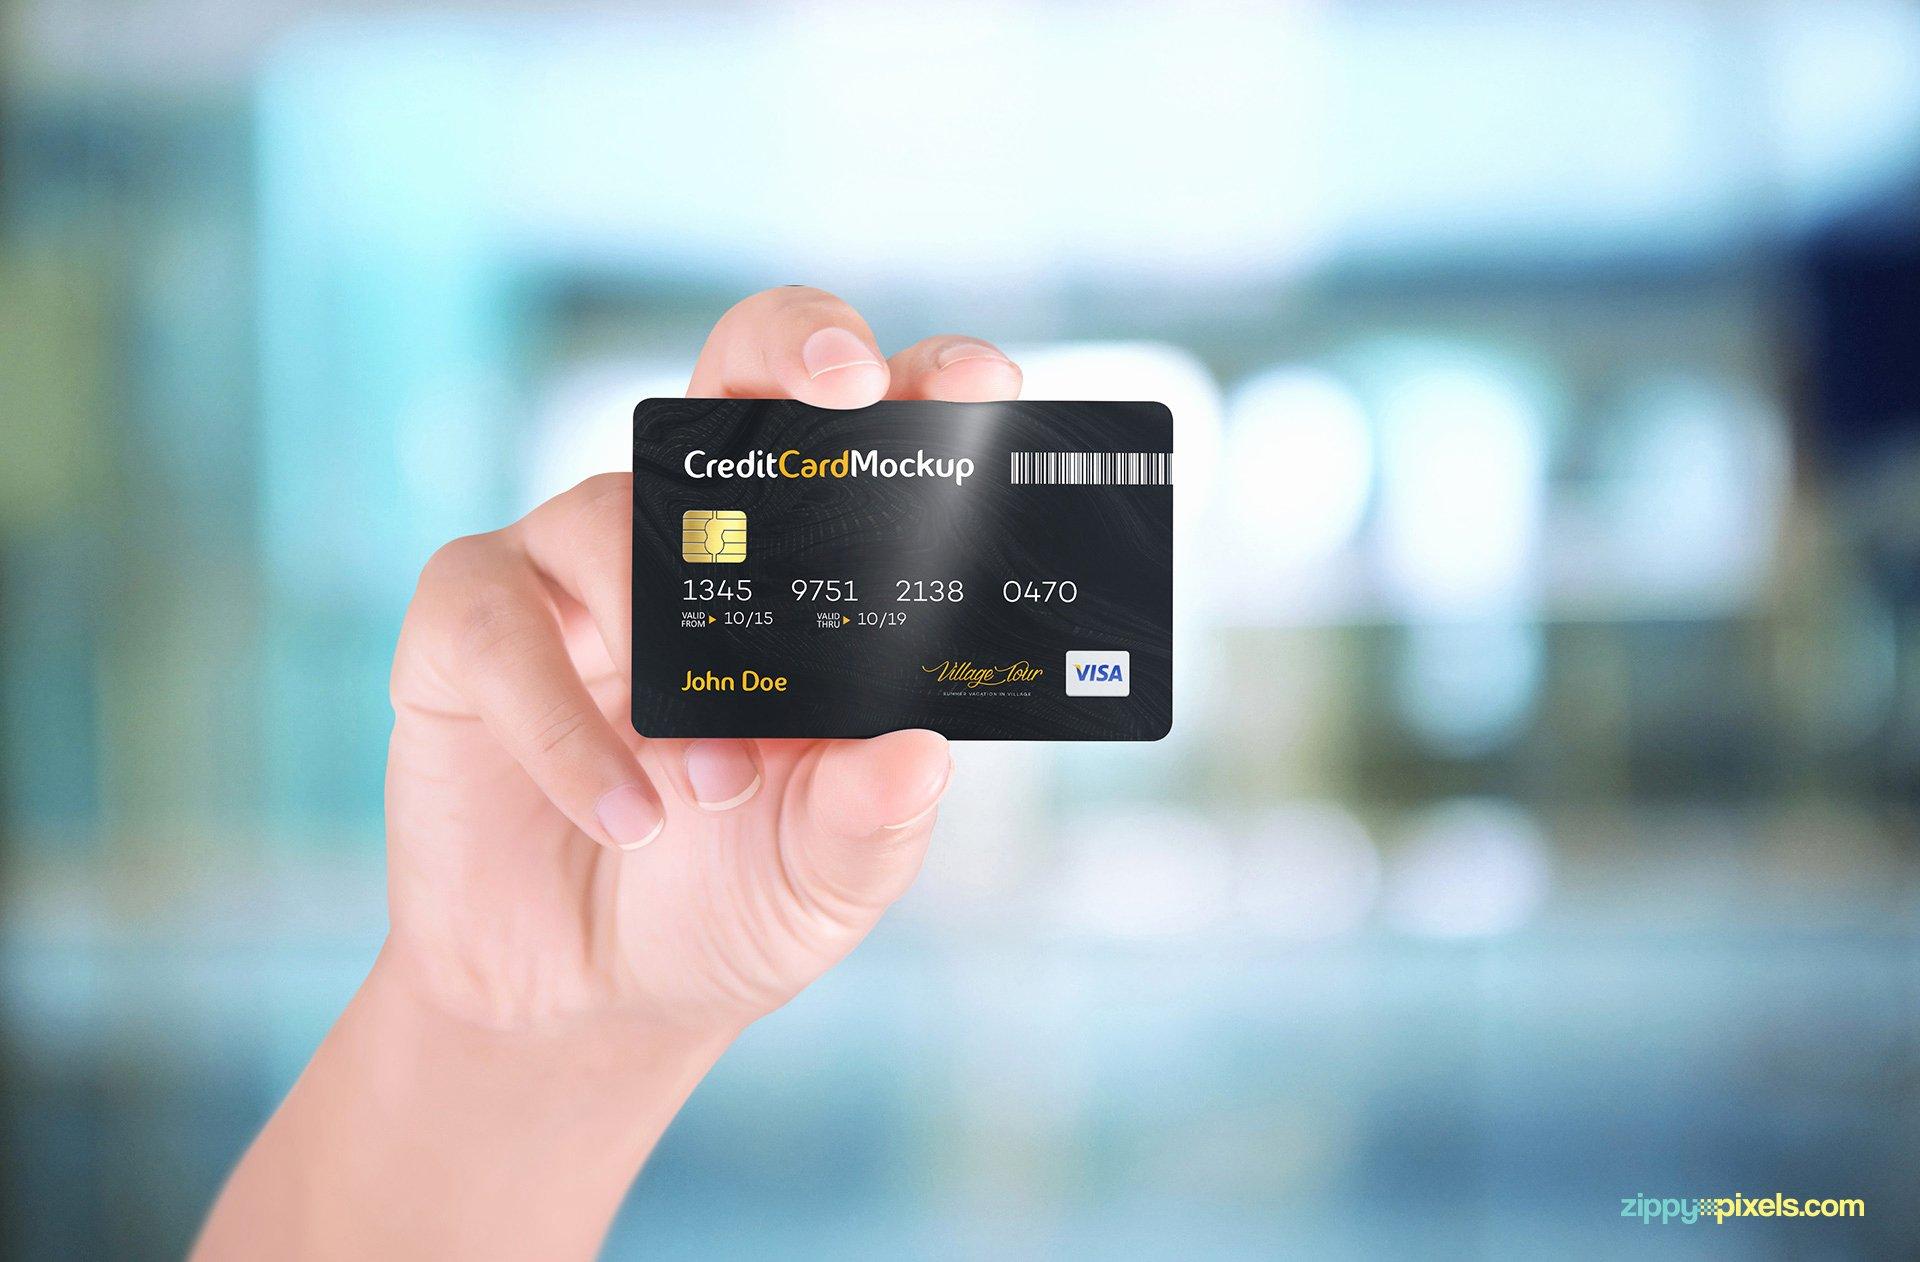 Credit Card Mockup Psd Inspirational Free Credit Card Mockup